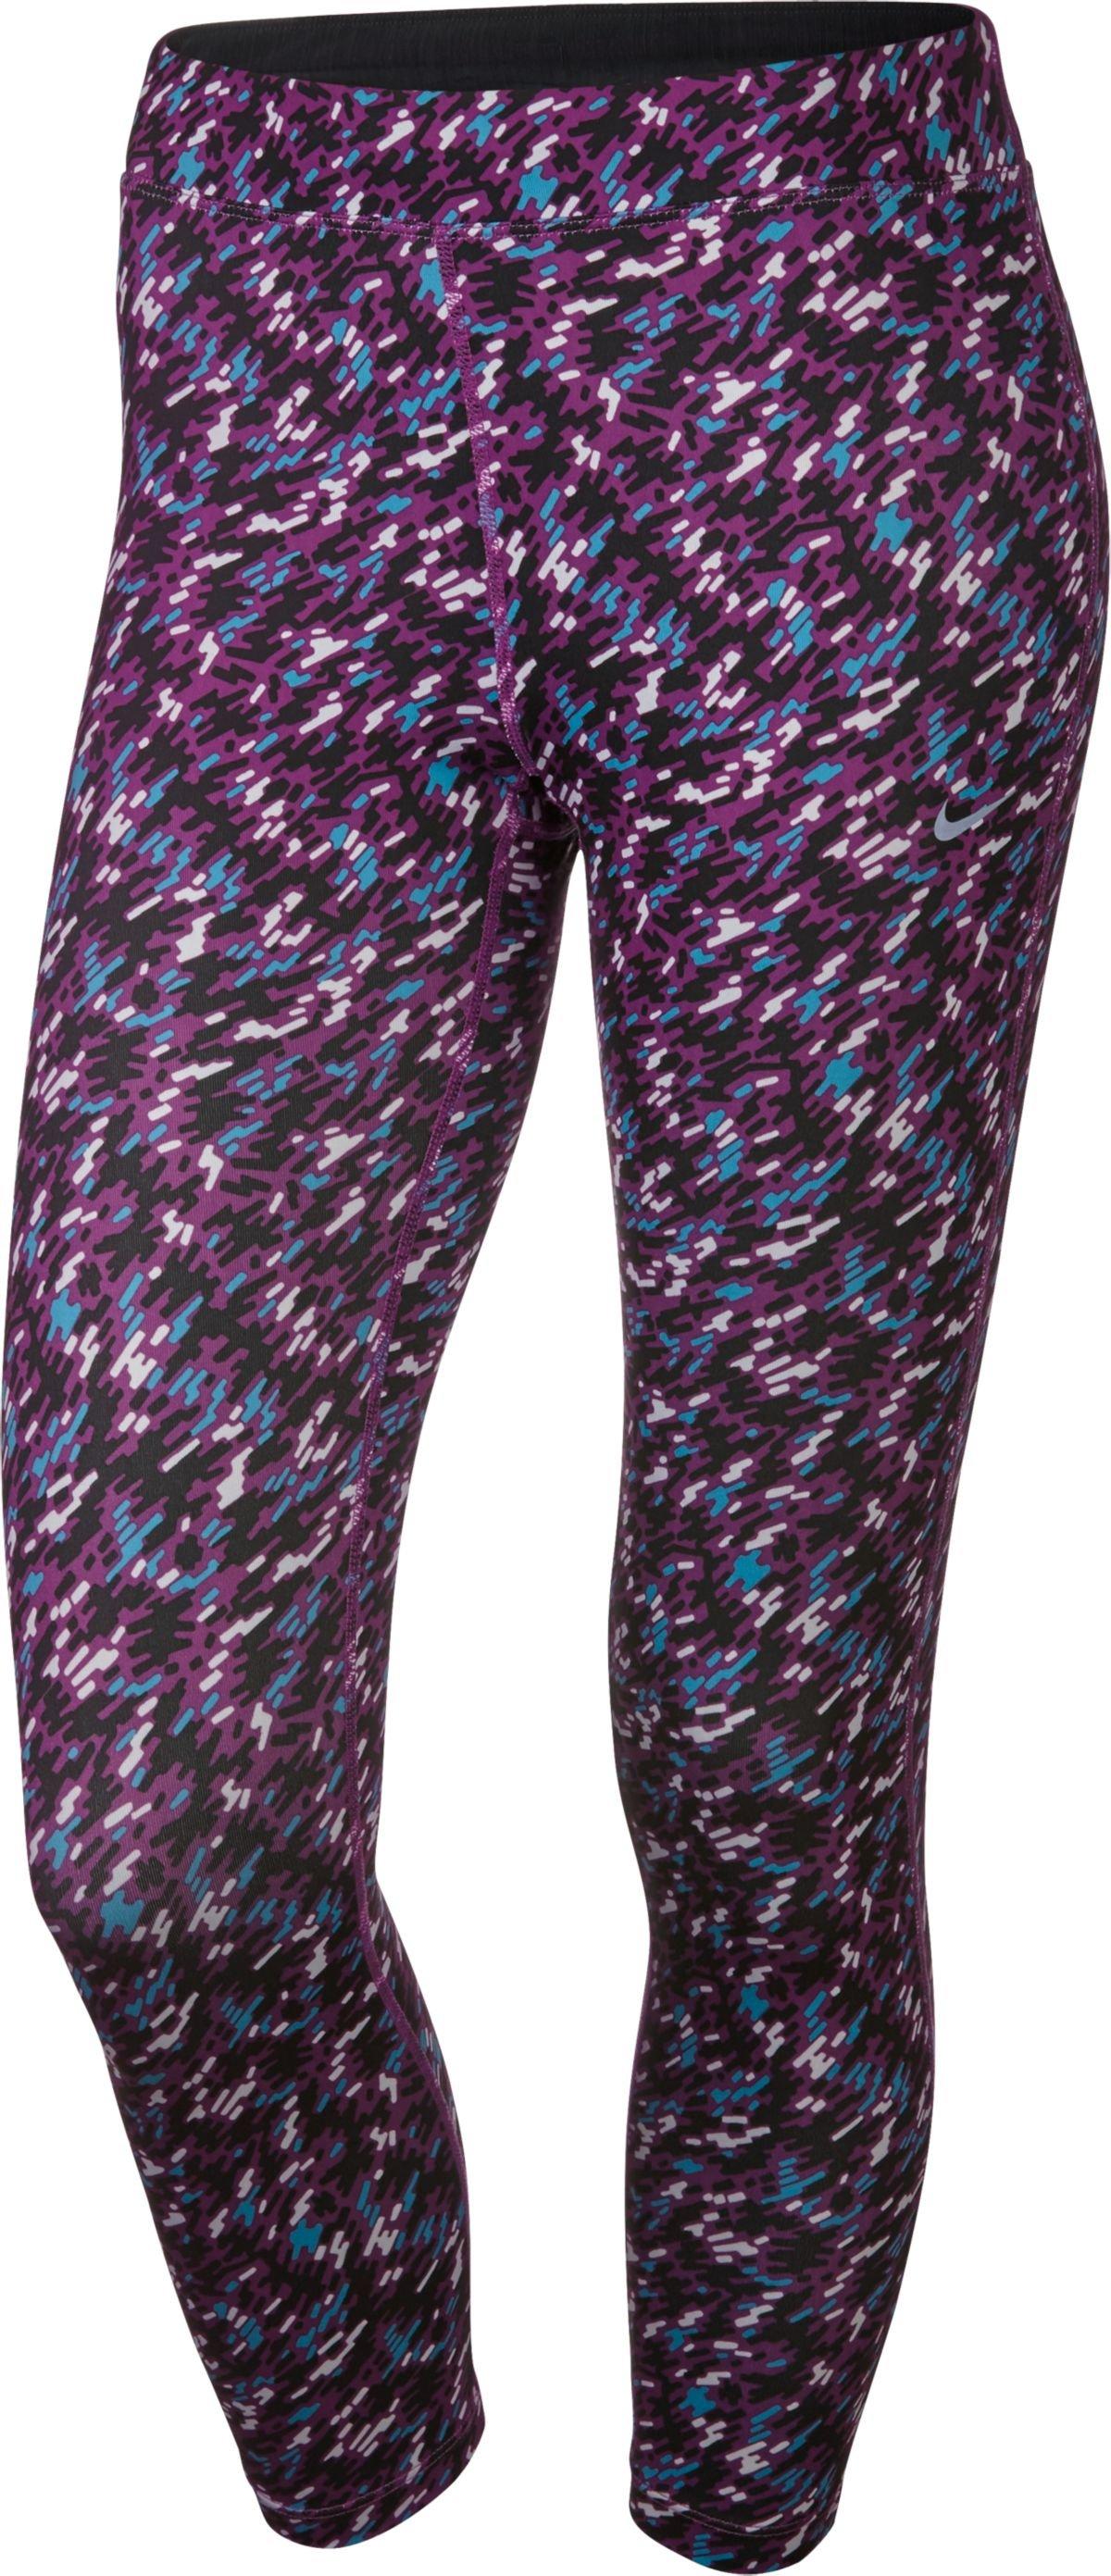 Kalhoty Nike PRONTO ESSENTIAL CROP